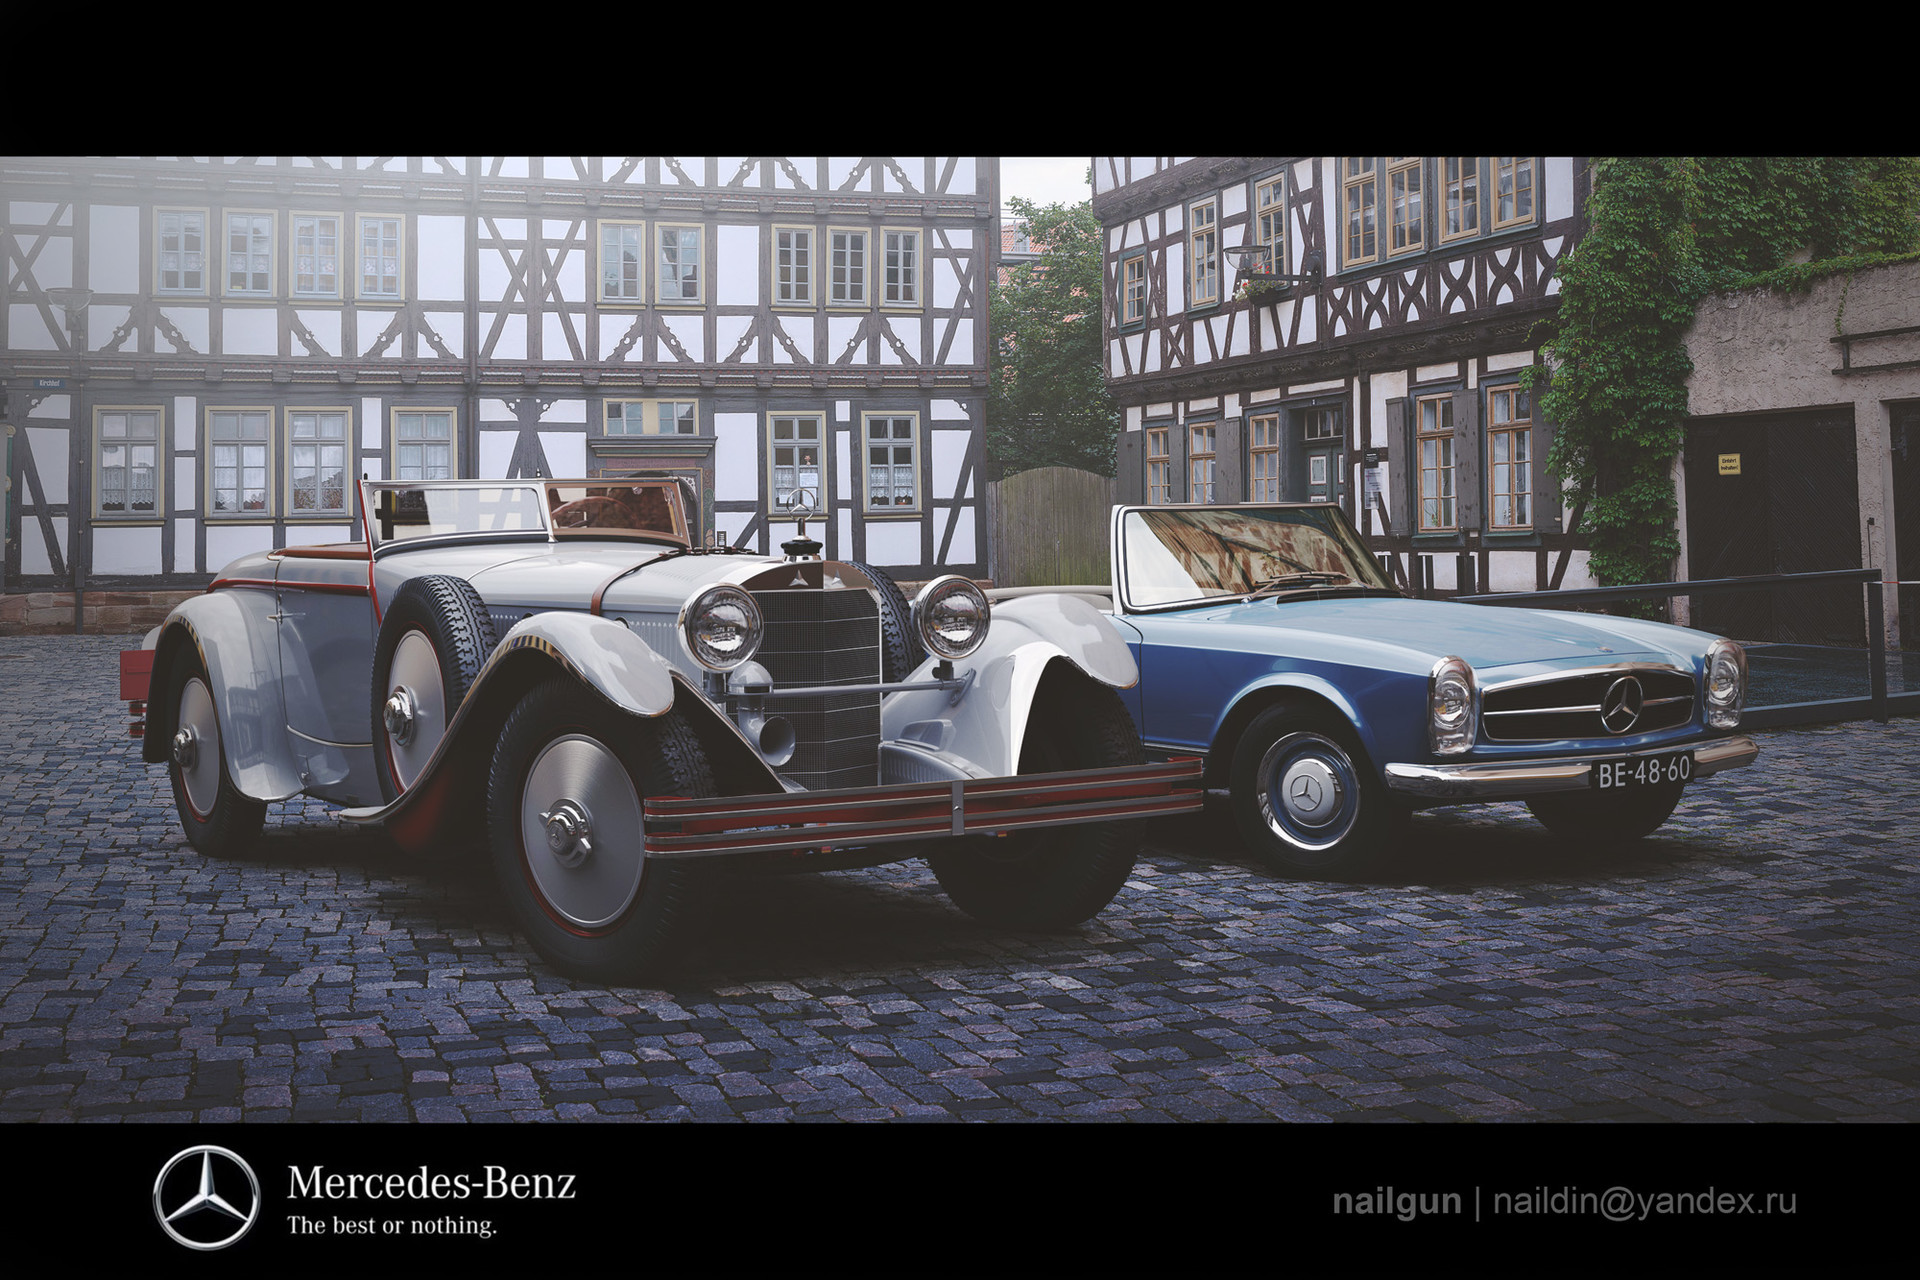 Nail khusnutdinov mercedes benz s680 torpedo roadster for Mercedes benz s680